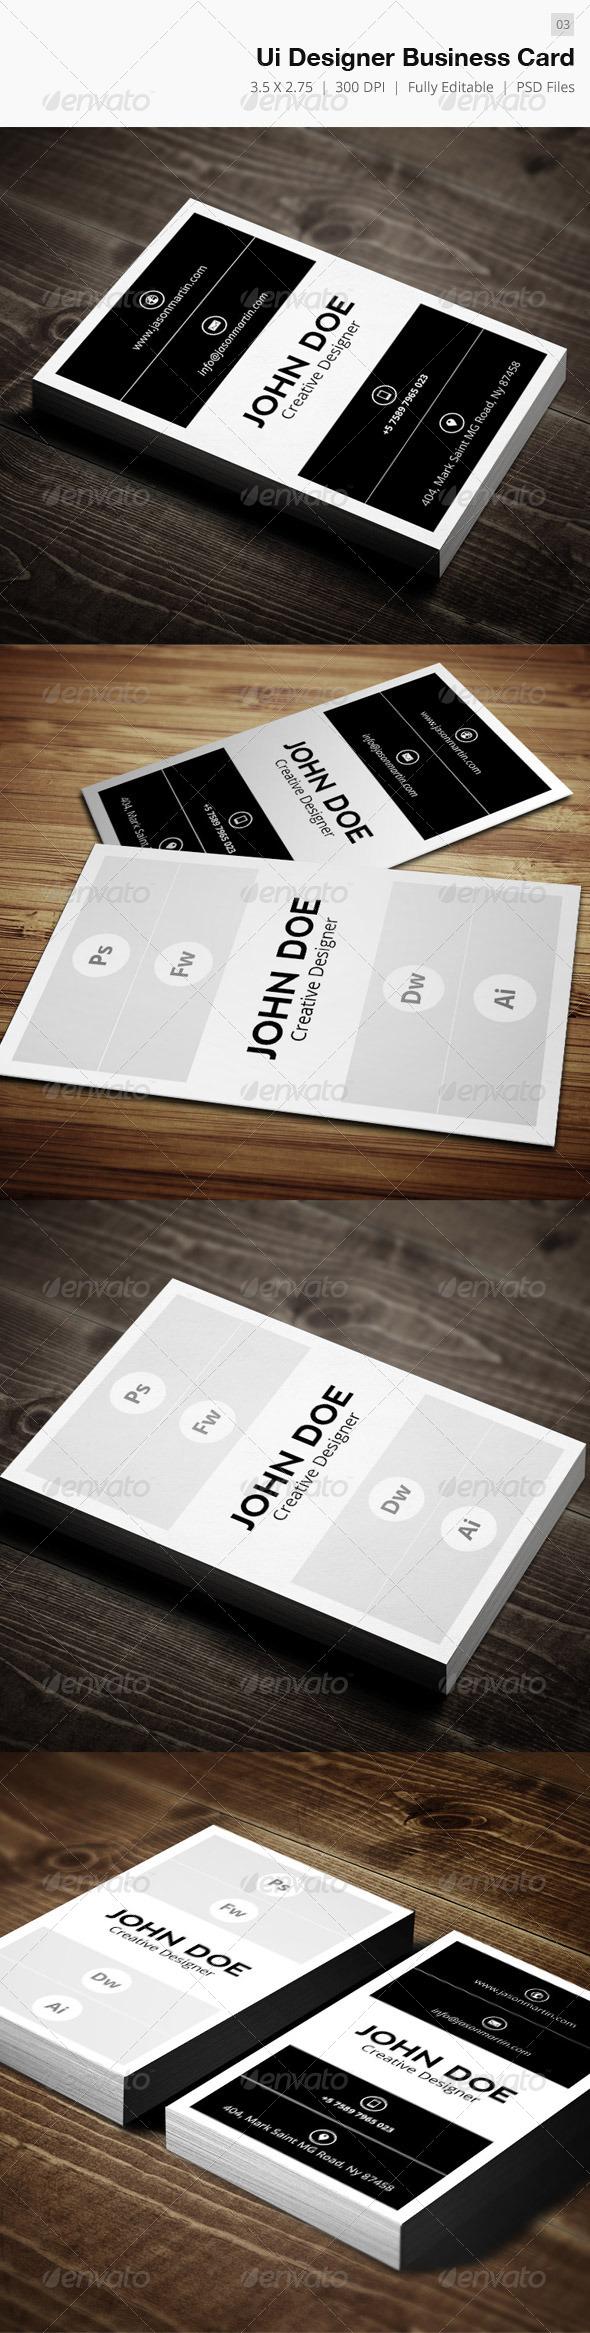 Ui Designer Business Card - 03 - Creative Business Cards